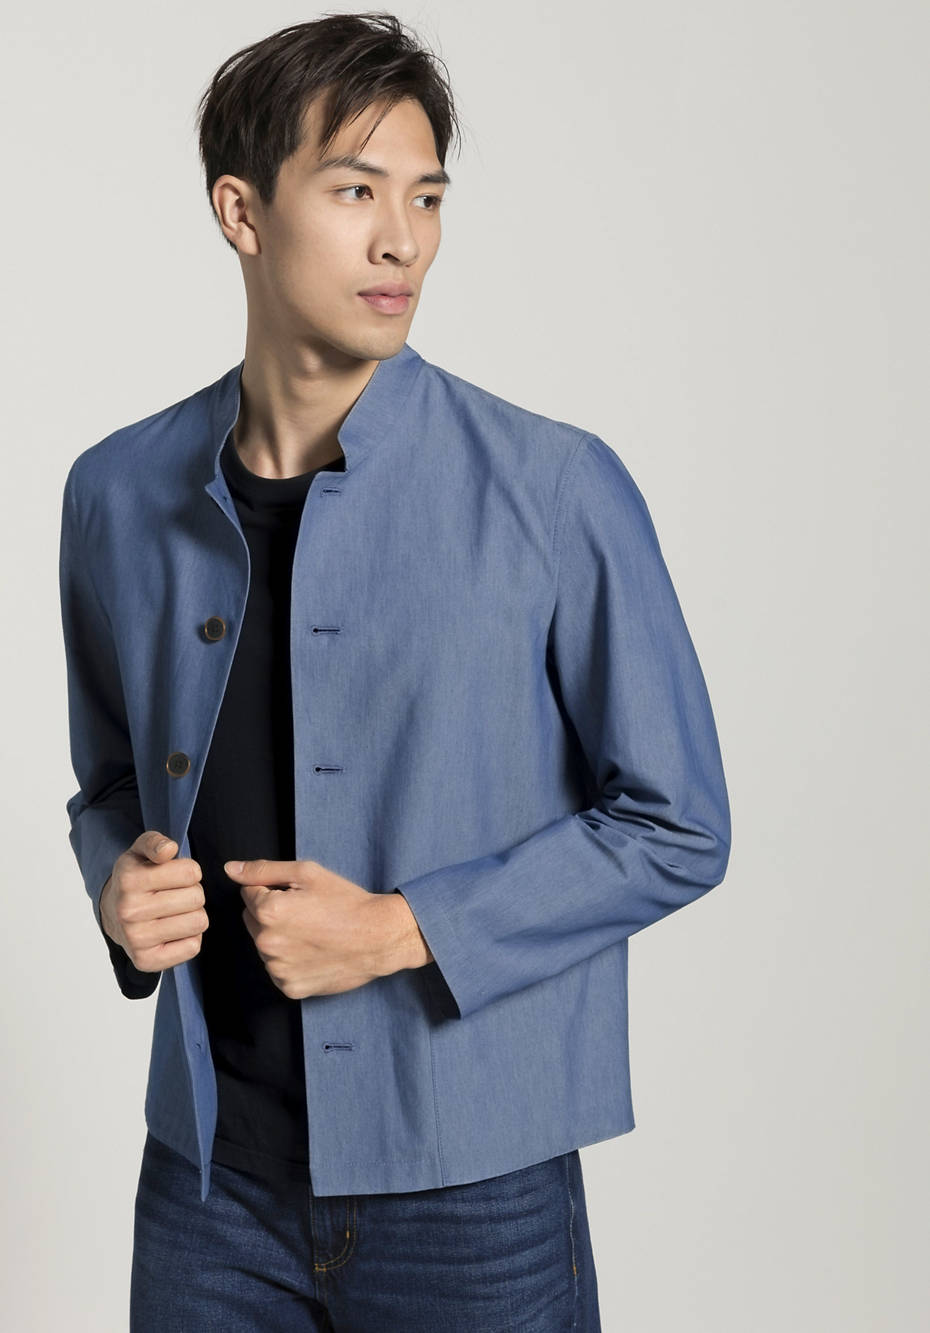 Overshirt made from banana fibers with organic cotton